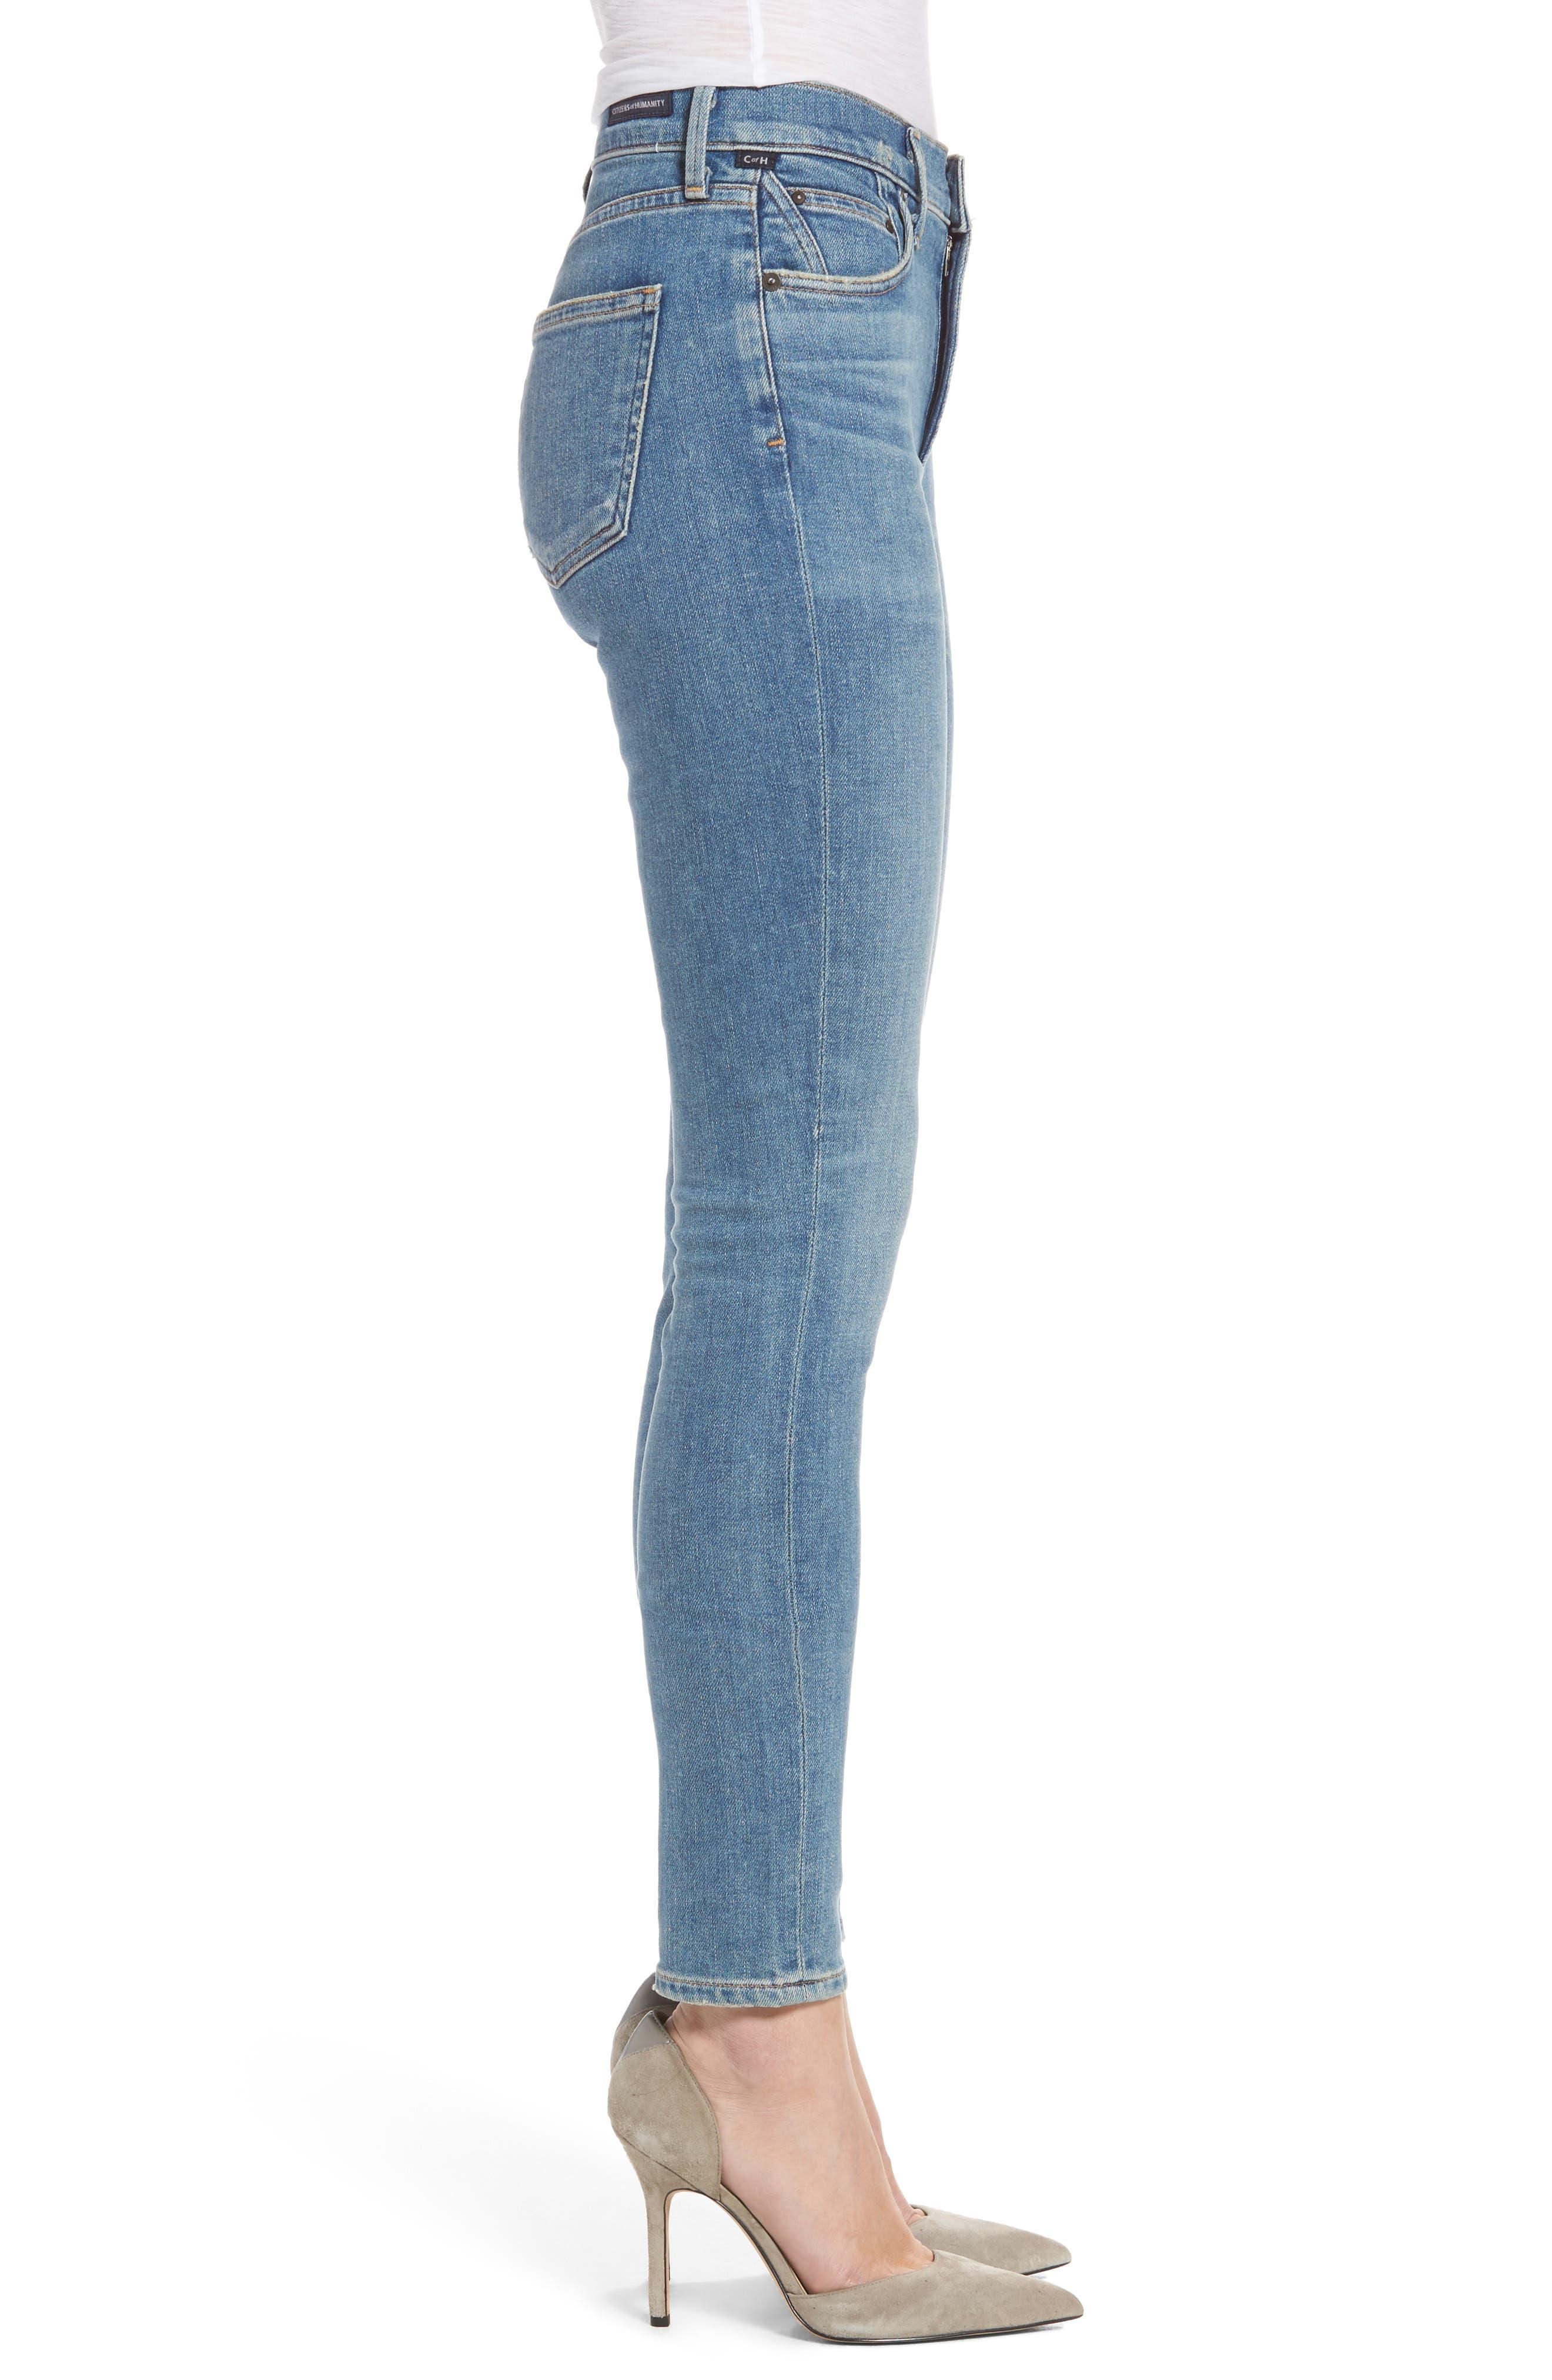 Alternate Image 3  - Citizens of Humanity Rocket High Waist Skinny Jeans (Reyes)